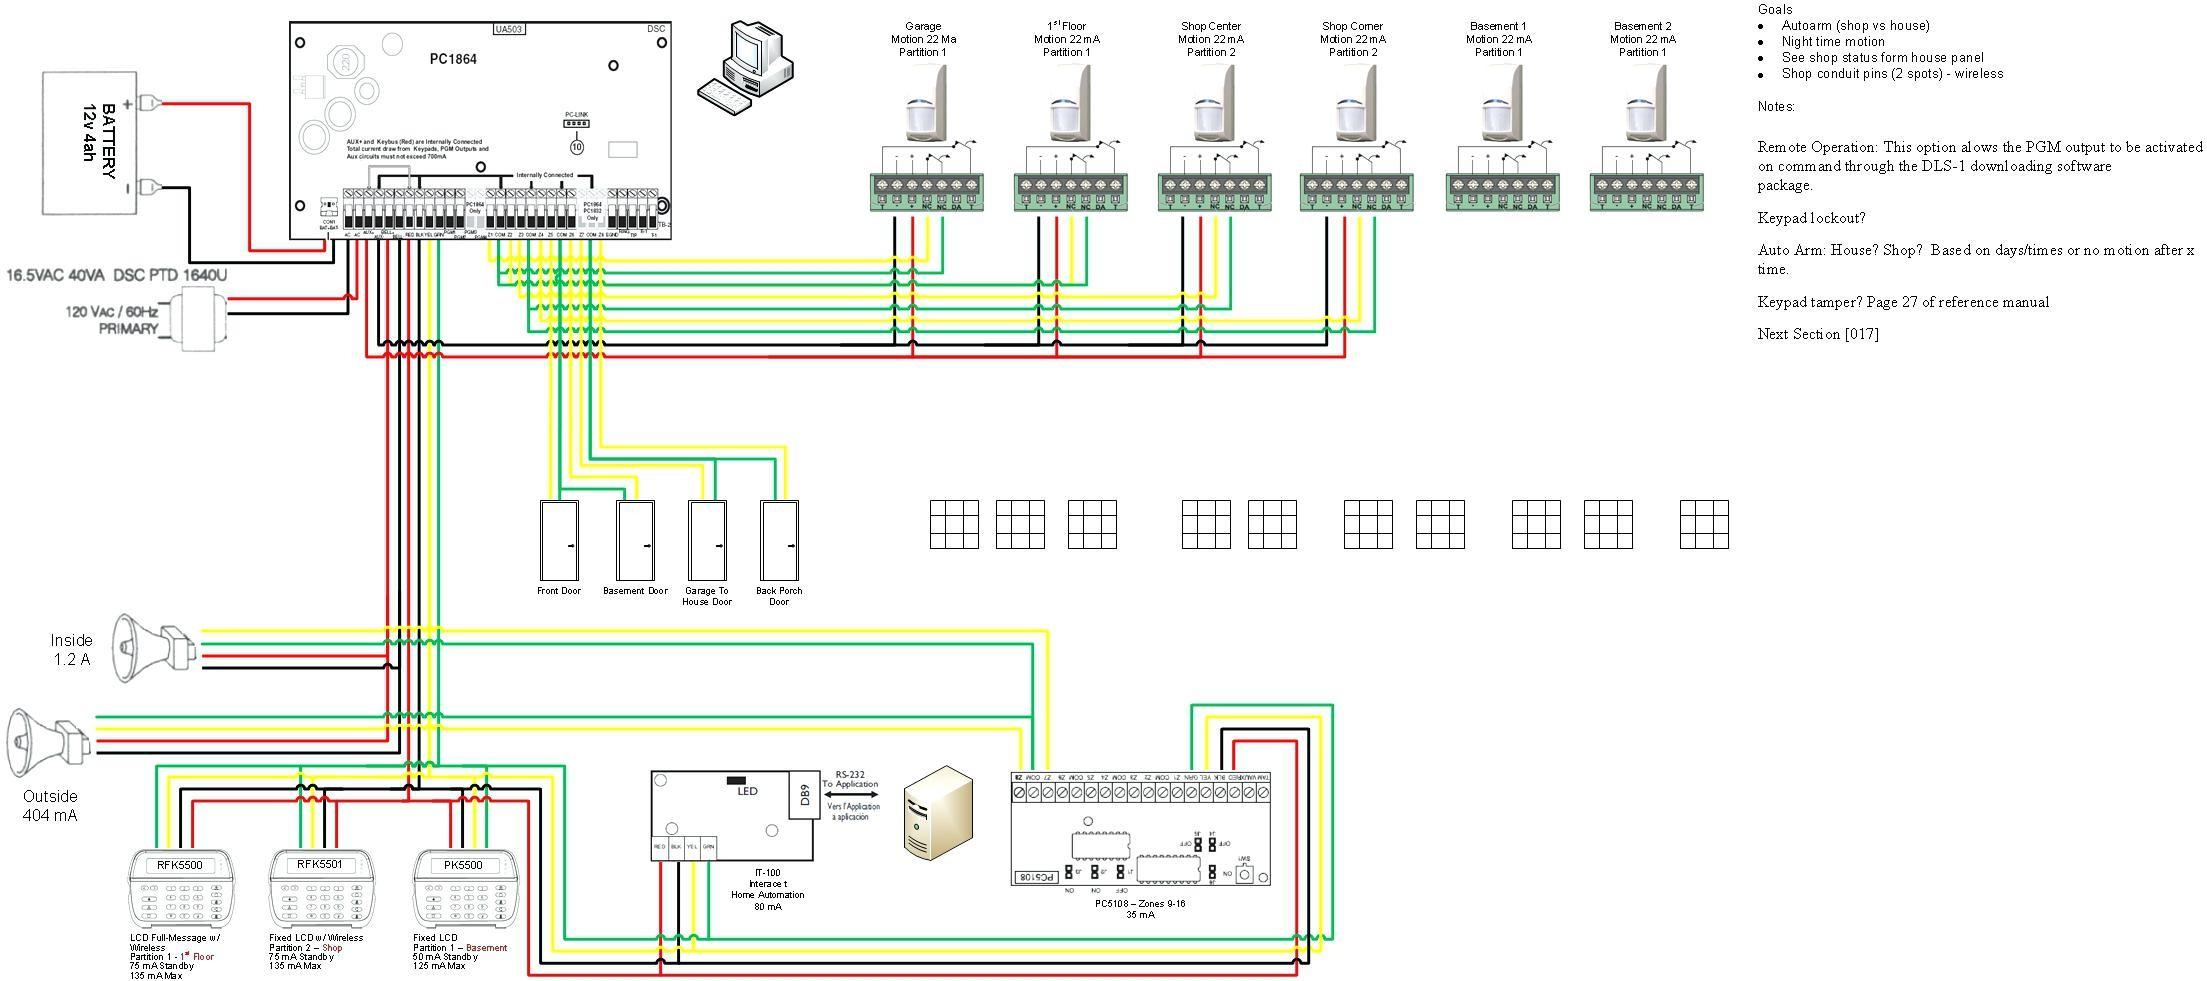 Audiovox Car Alarm Wiring Diagram Beautiful Car Alarm System Wiring Diagram Ideas Everything You Of Audiovox Car Alarm Wiring Diagram